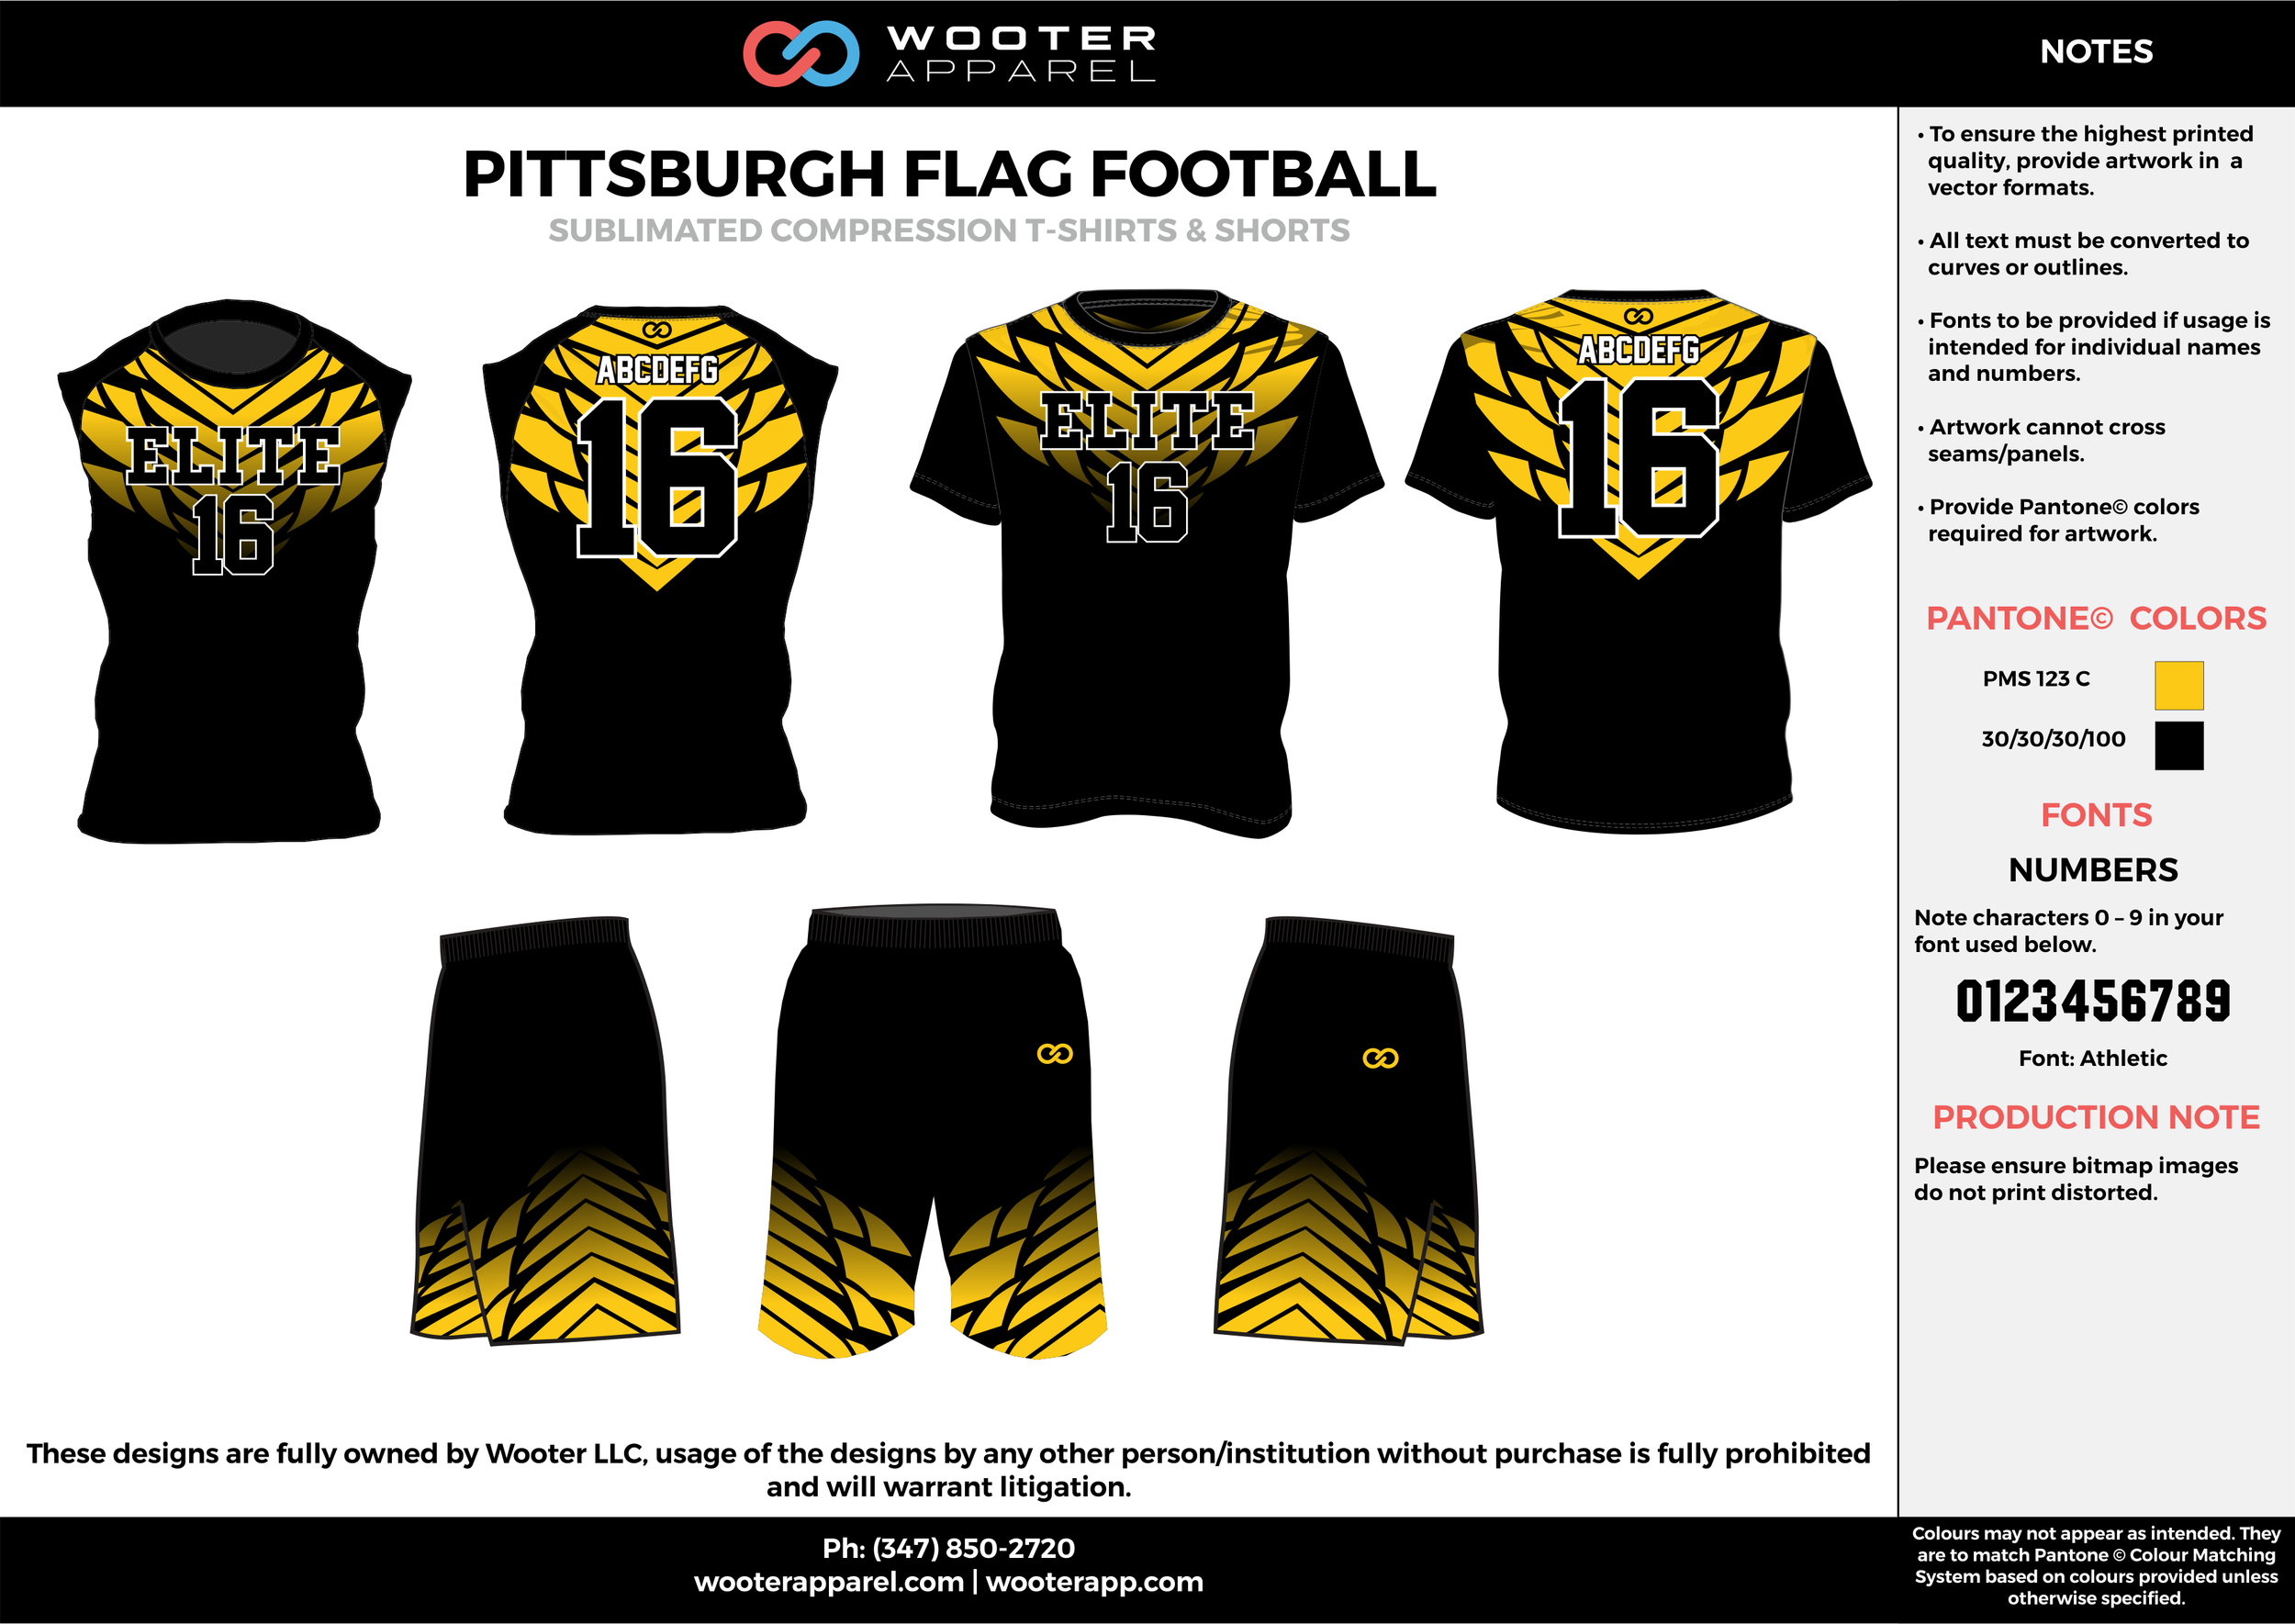 PITTSBURGH FLAG FOOTBALL yellow black flag football uniforms jerseys shorts